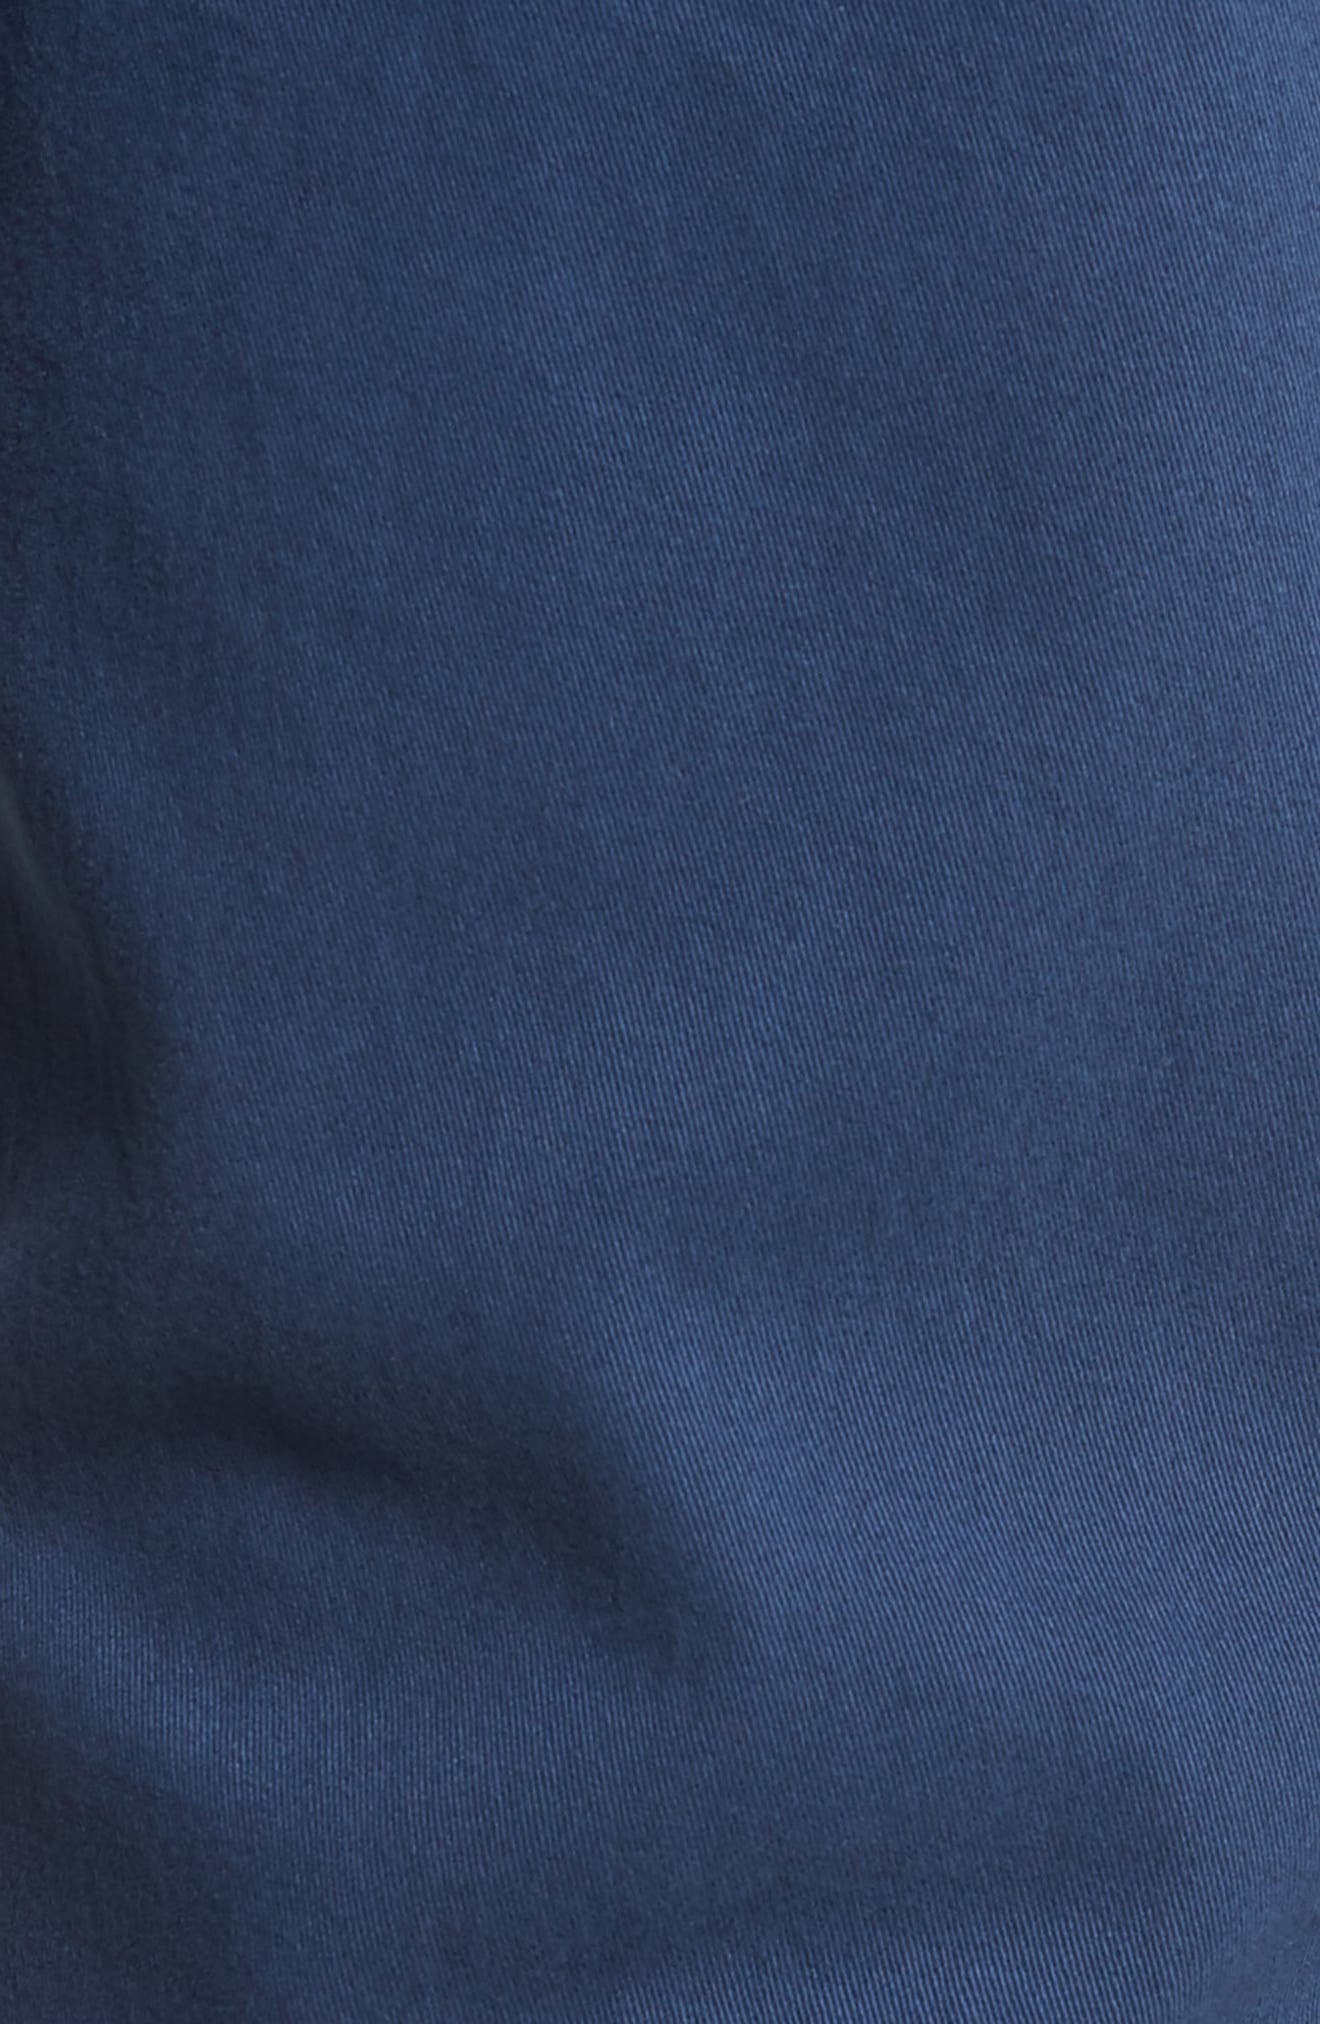 Jeans Co. Kingston Slim Straight Leg Jeans,                             Alternate thumbnail 5, color,                             BLUE TWILIGHT